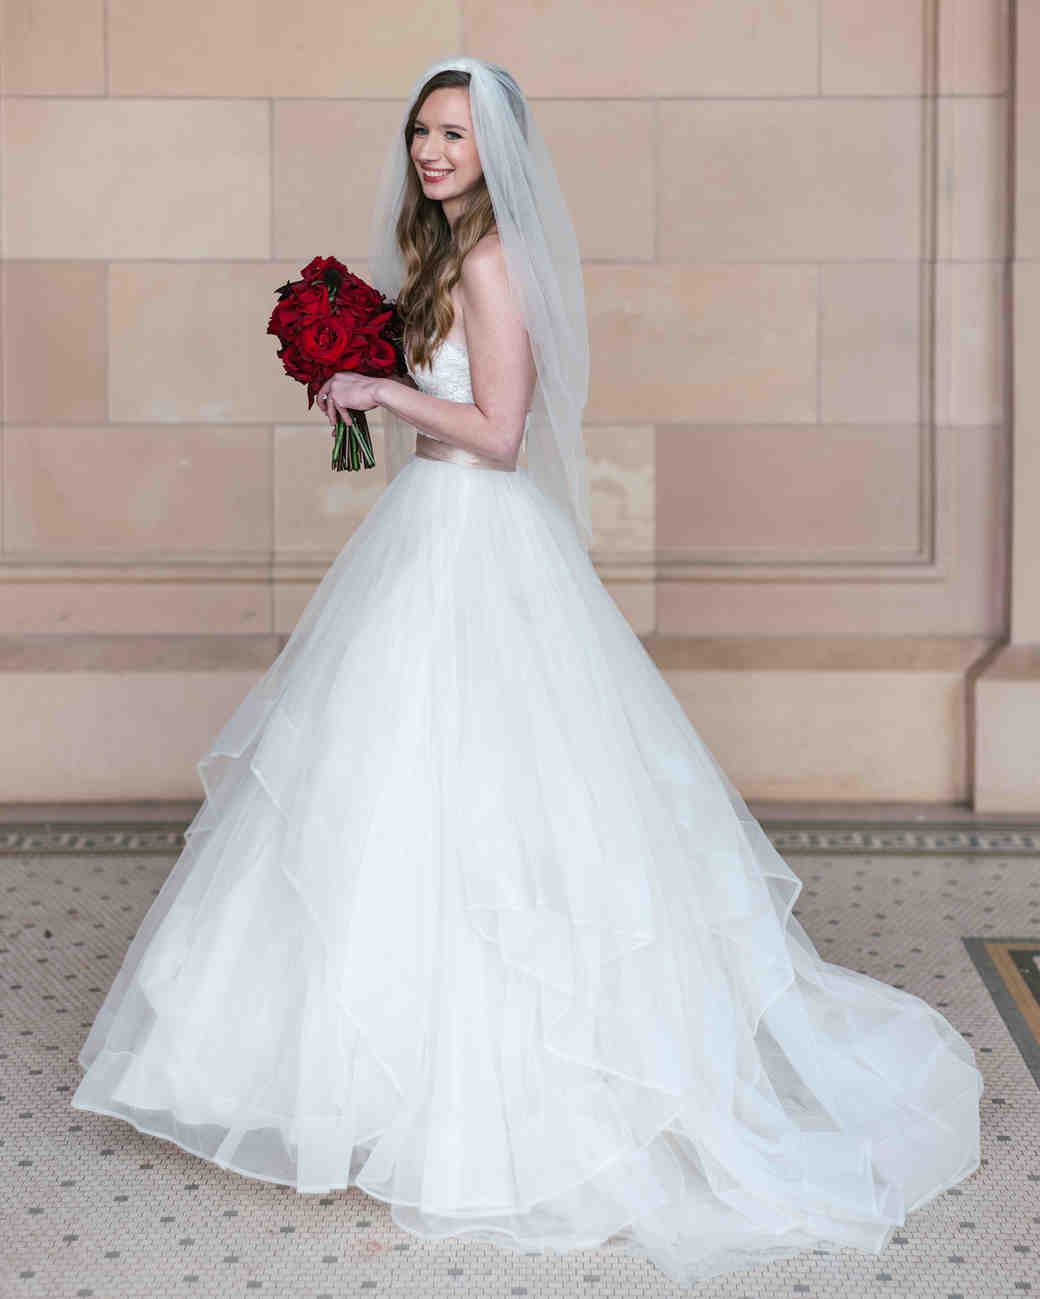 johnna colbry bride in wedding dress